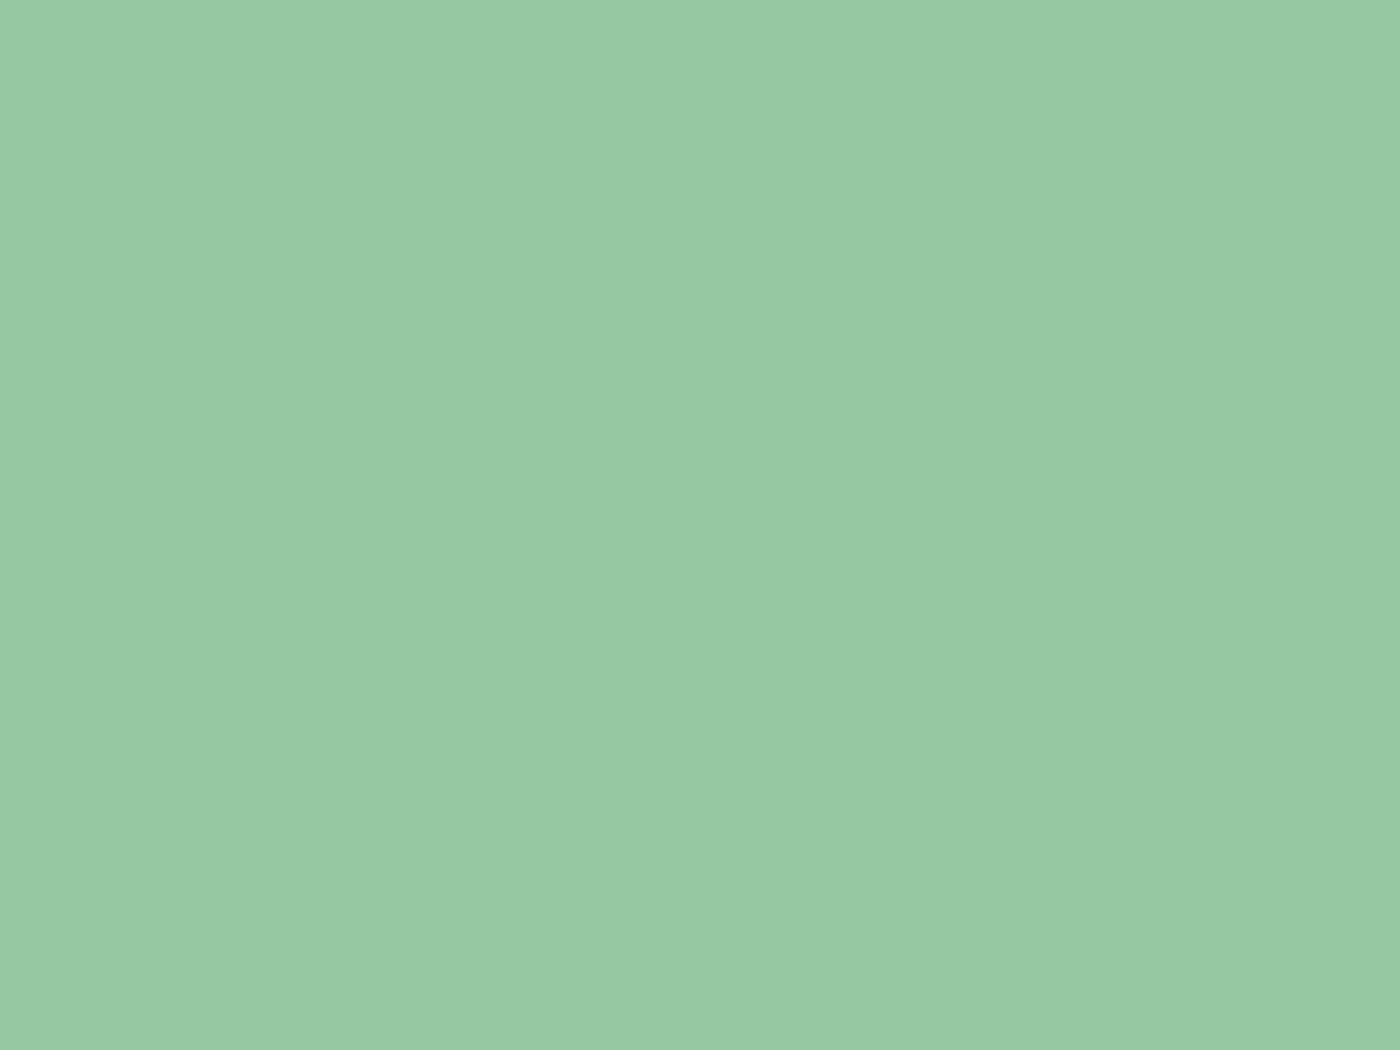 1400x1050 Eton Blue Solid Color Background